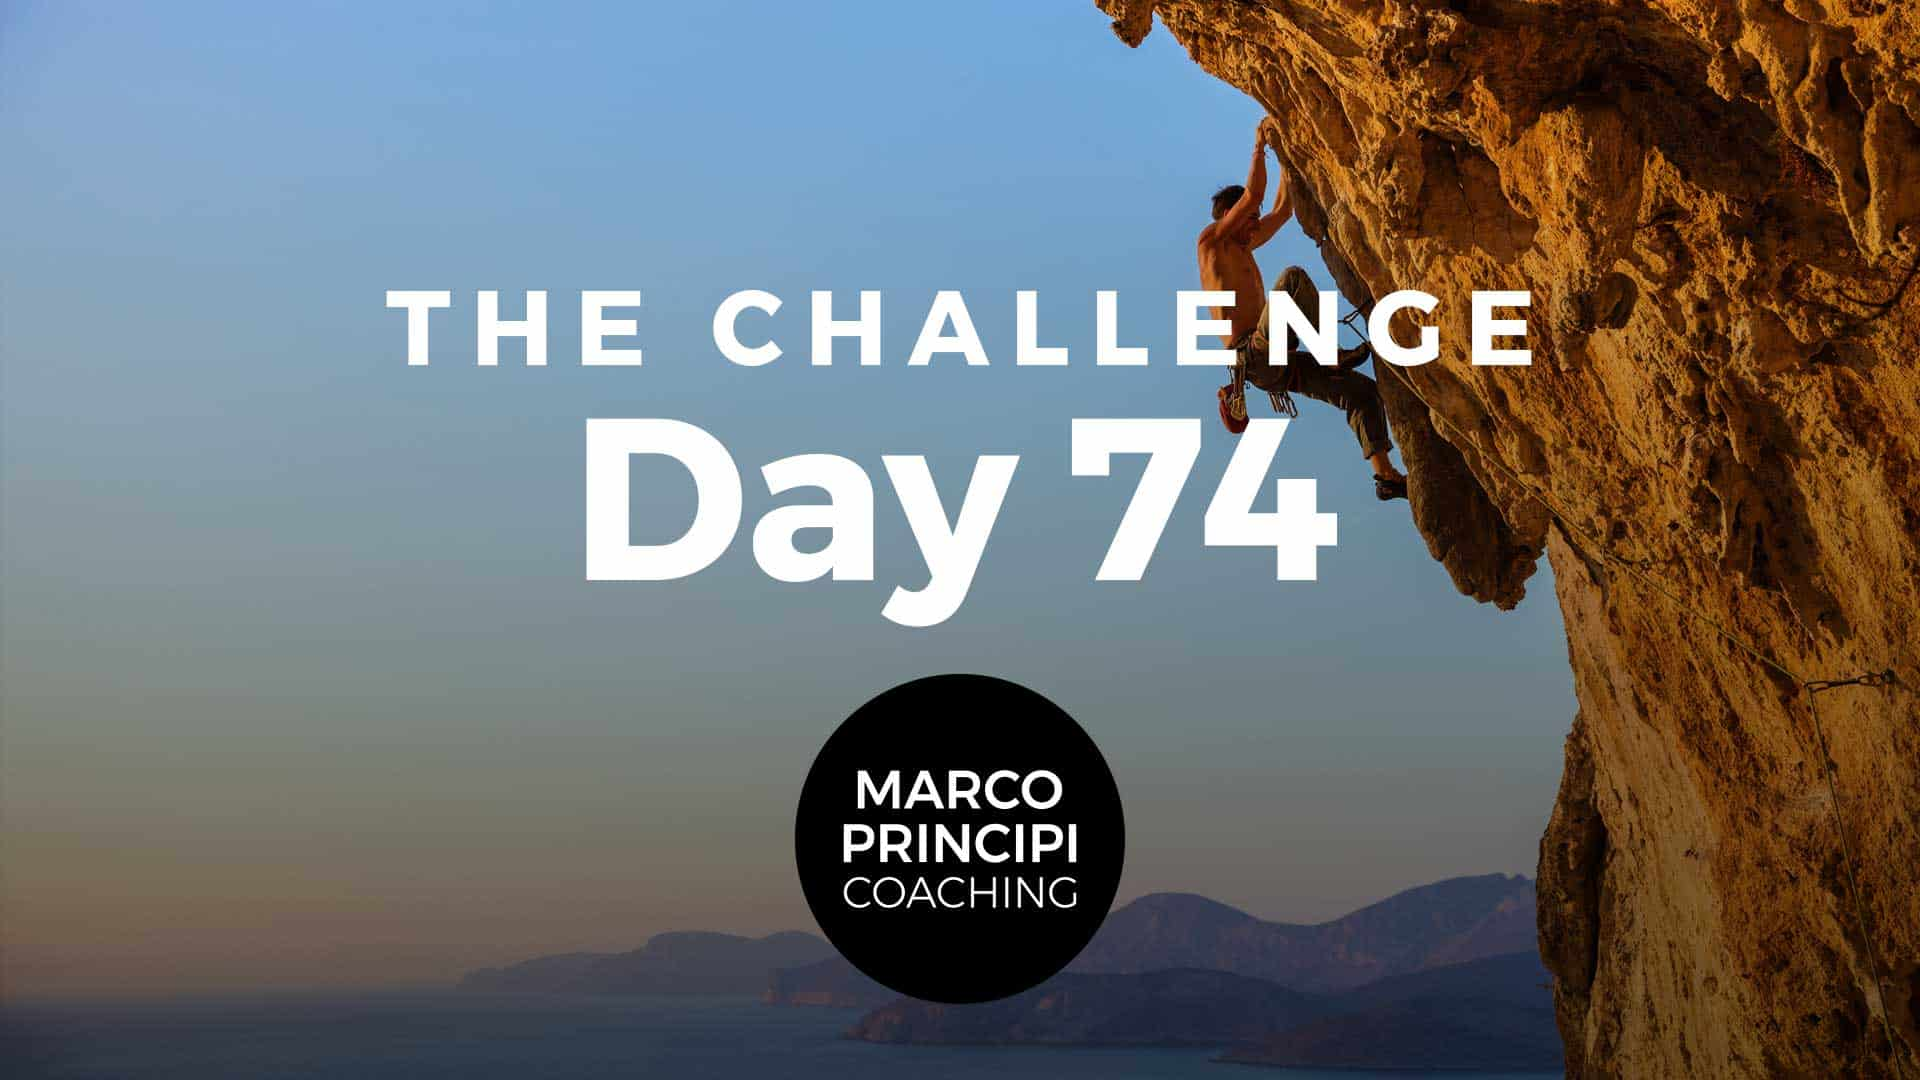 Marco Principi Coaching Challenge Day 74